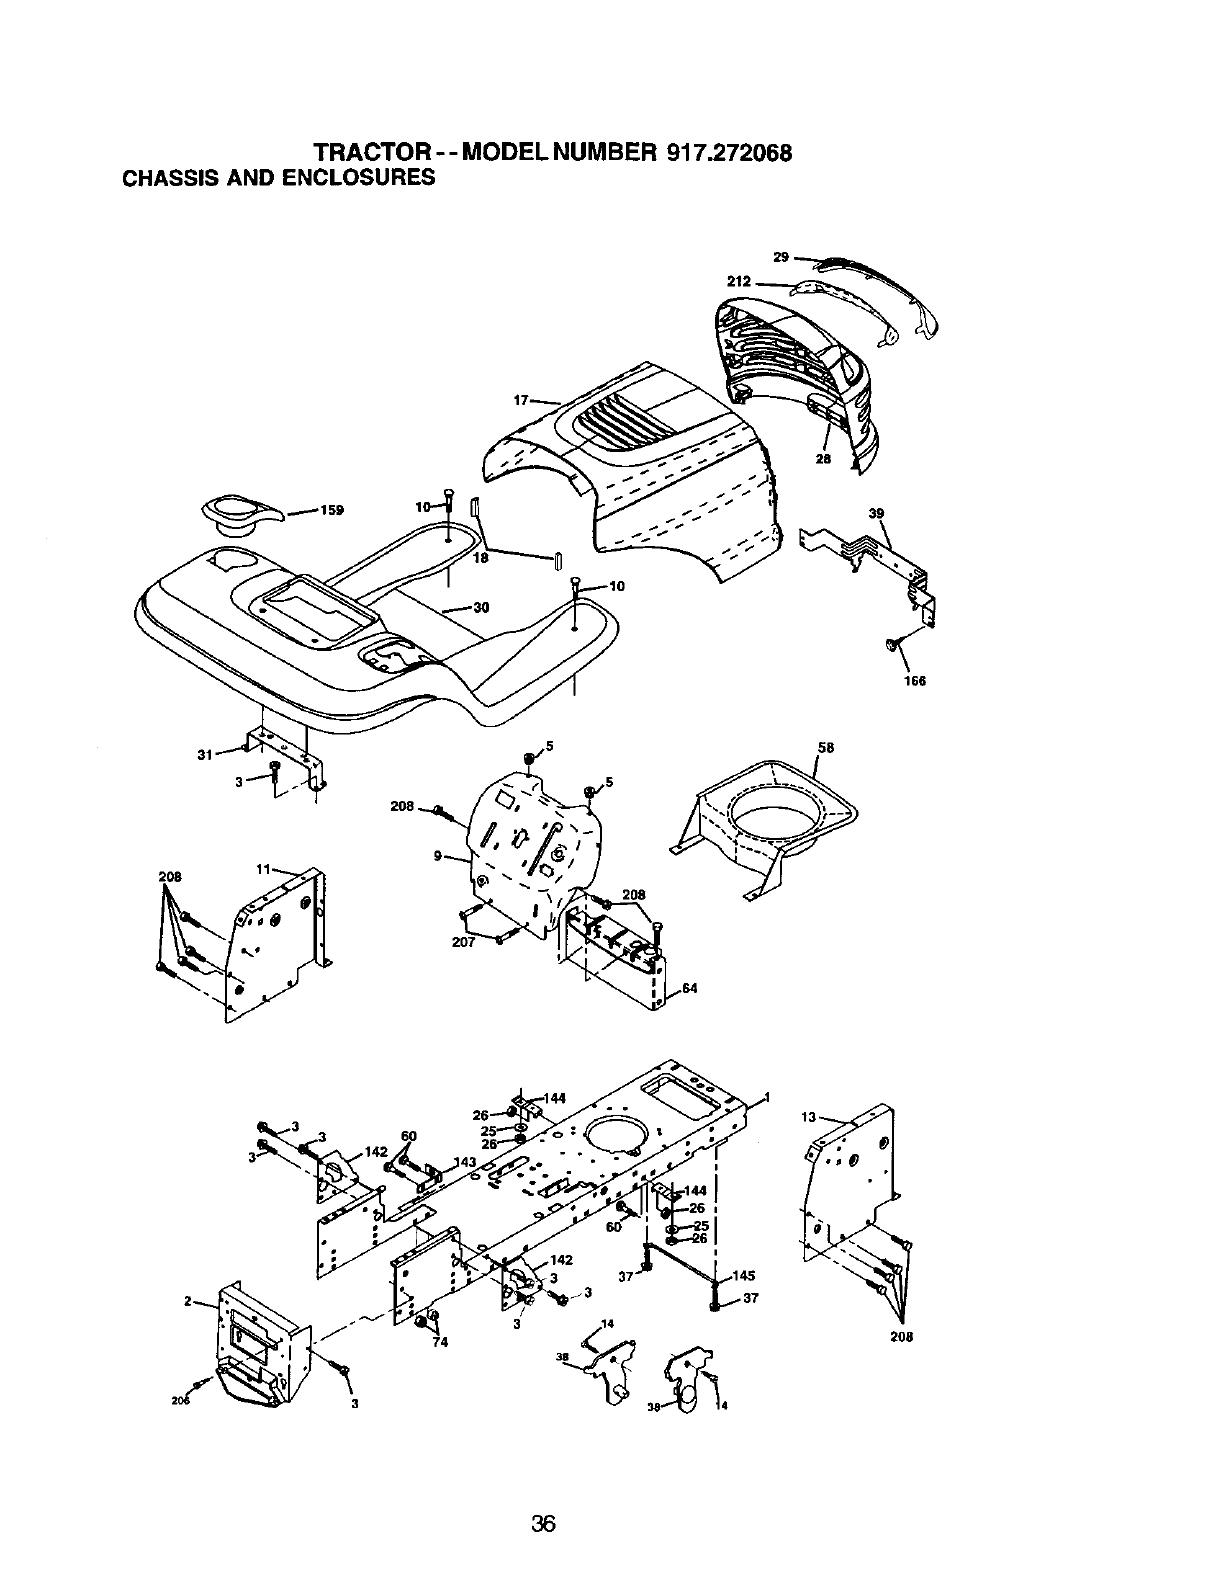 Craftsman 917 272068 Users Manual